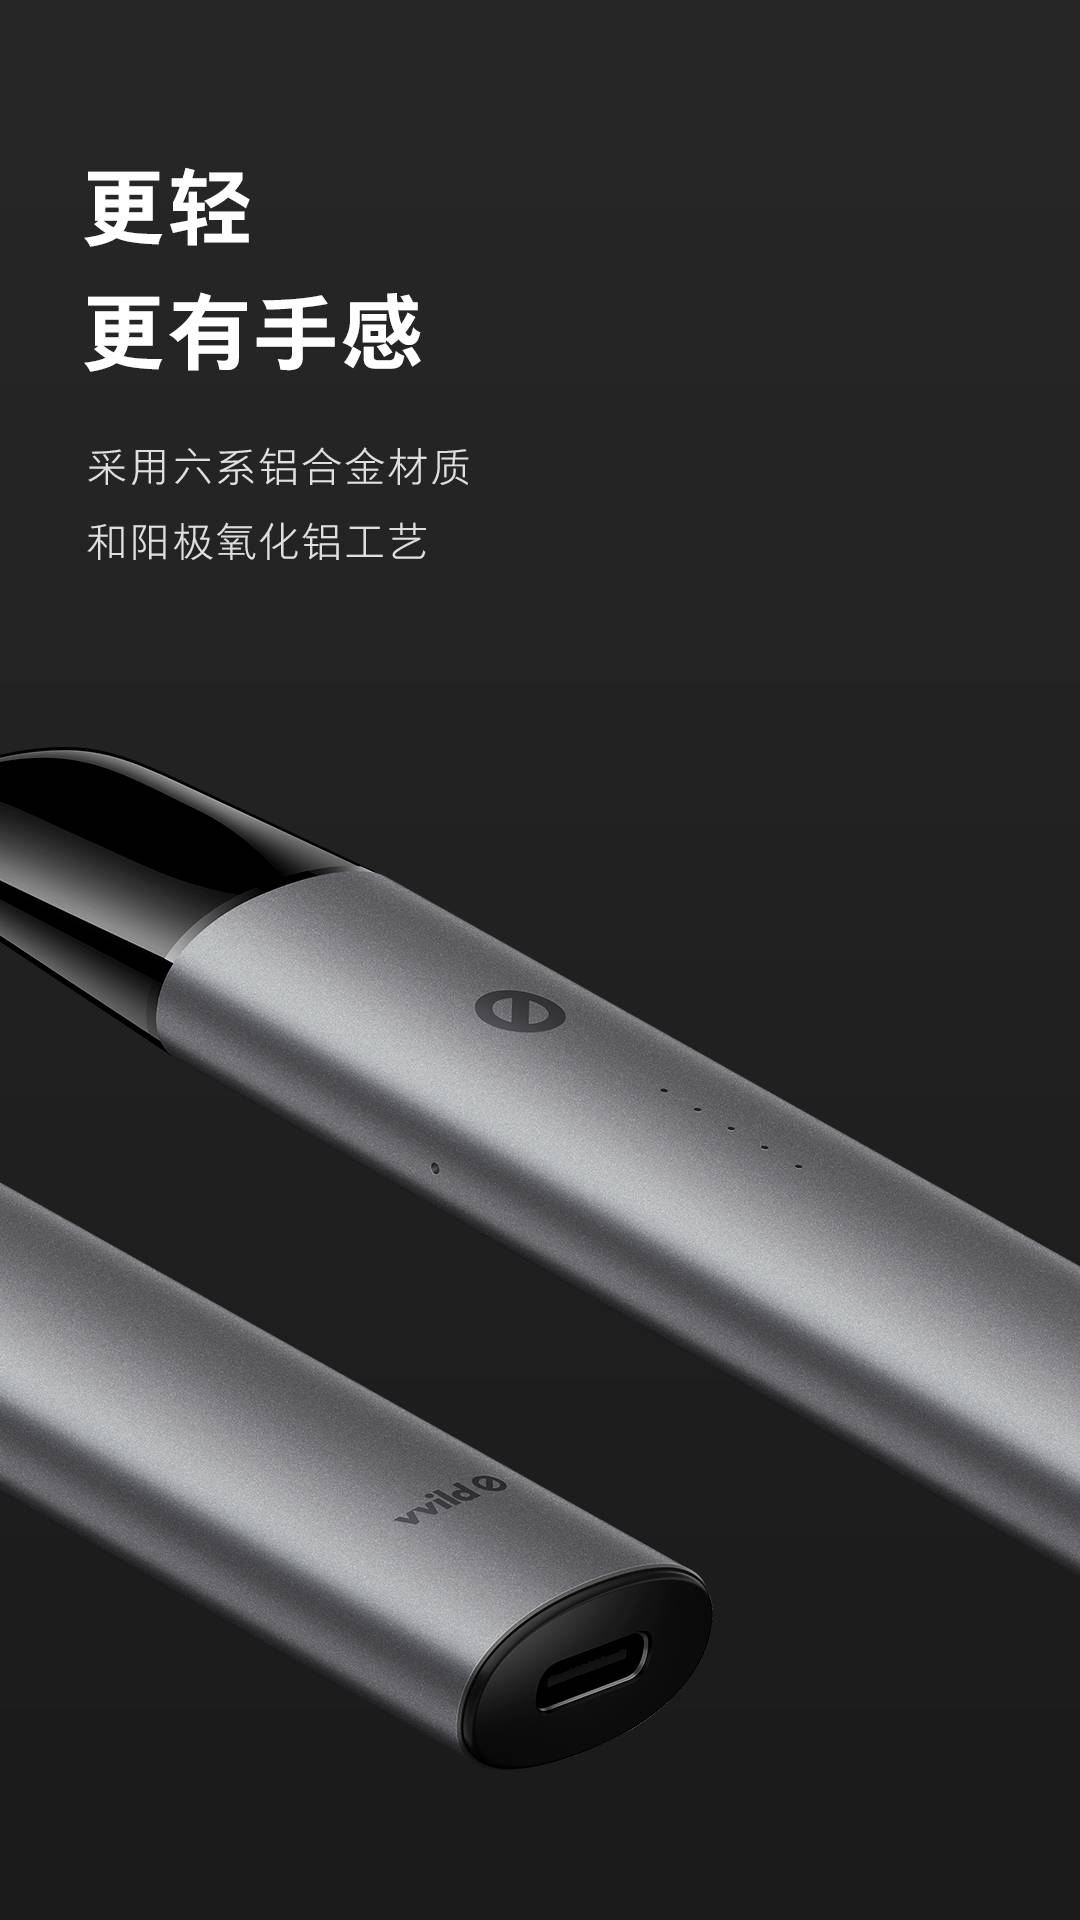 vvild小野V2电子烟设备正式上新;配置参数全新升级介绍!